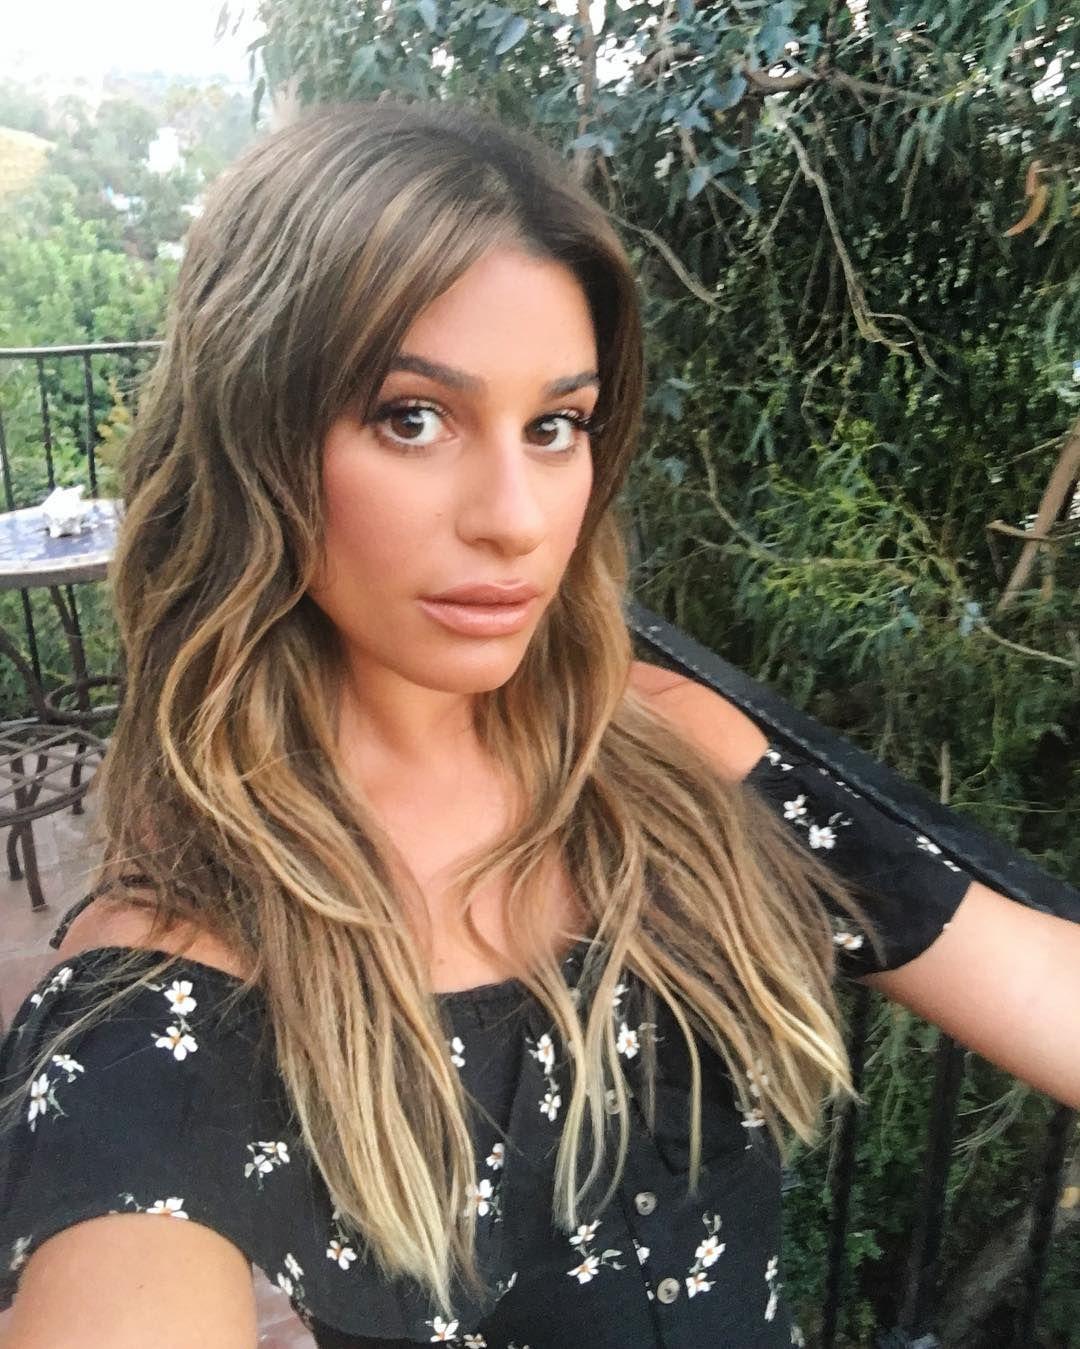 Cleavage Claudia Guarnieri nudes (58 photo), Sexy, Cleavage, Selfie, butt 2018